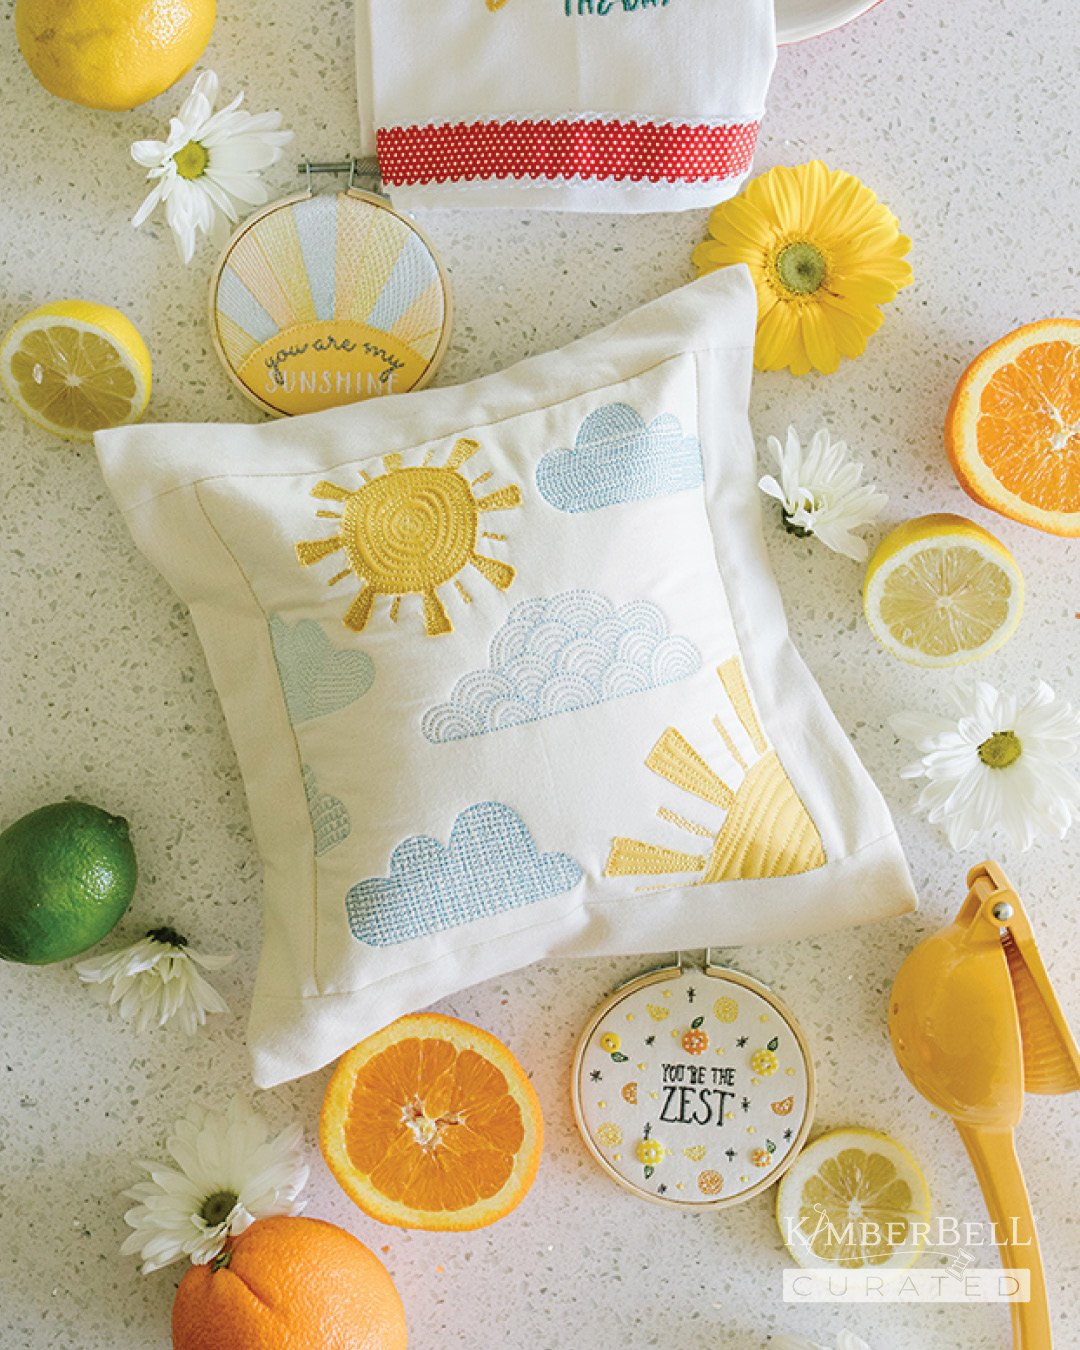 Kimberbell Curated Citrus & Sunshine